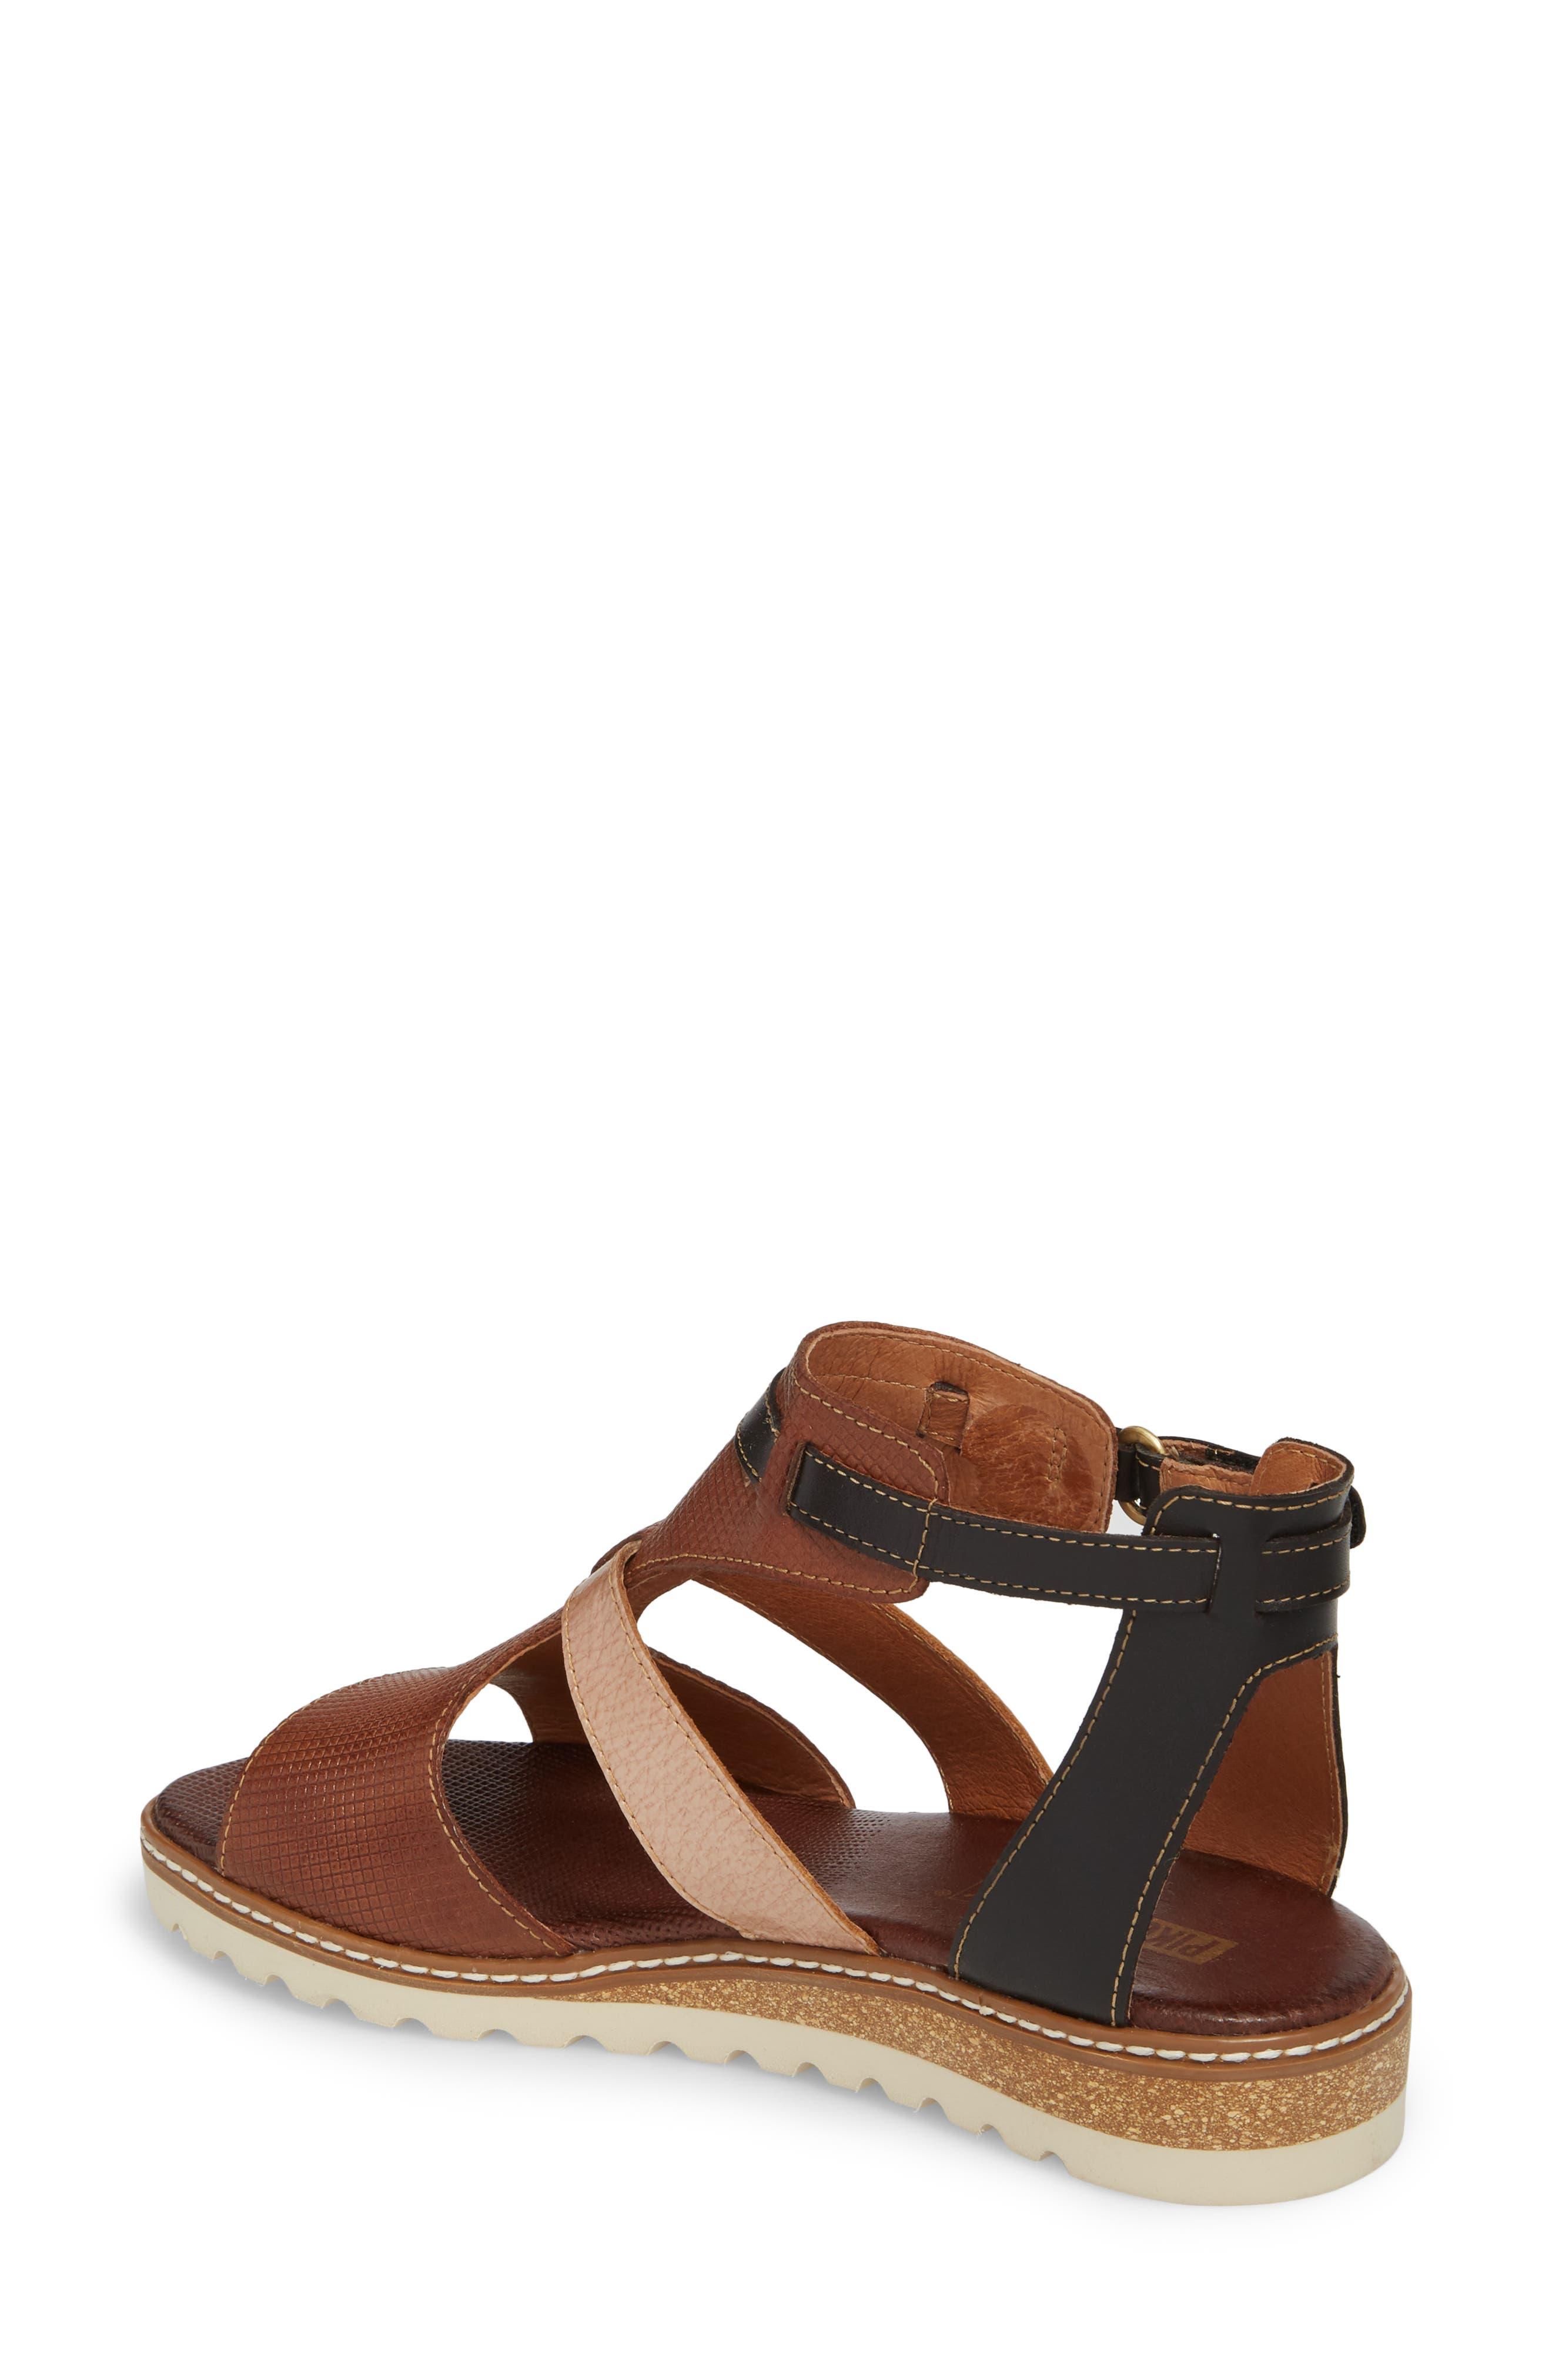 Alcudia Sandal,                             Alternate thumbnail 2, color,                             Cuero Leather